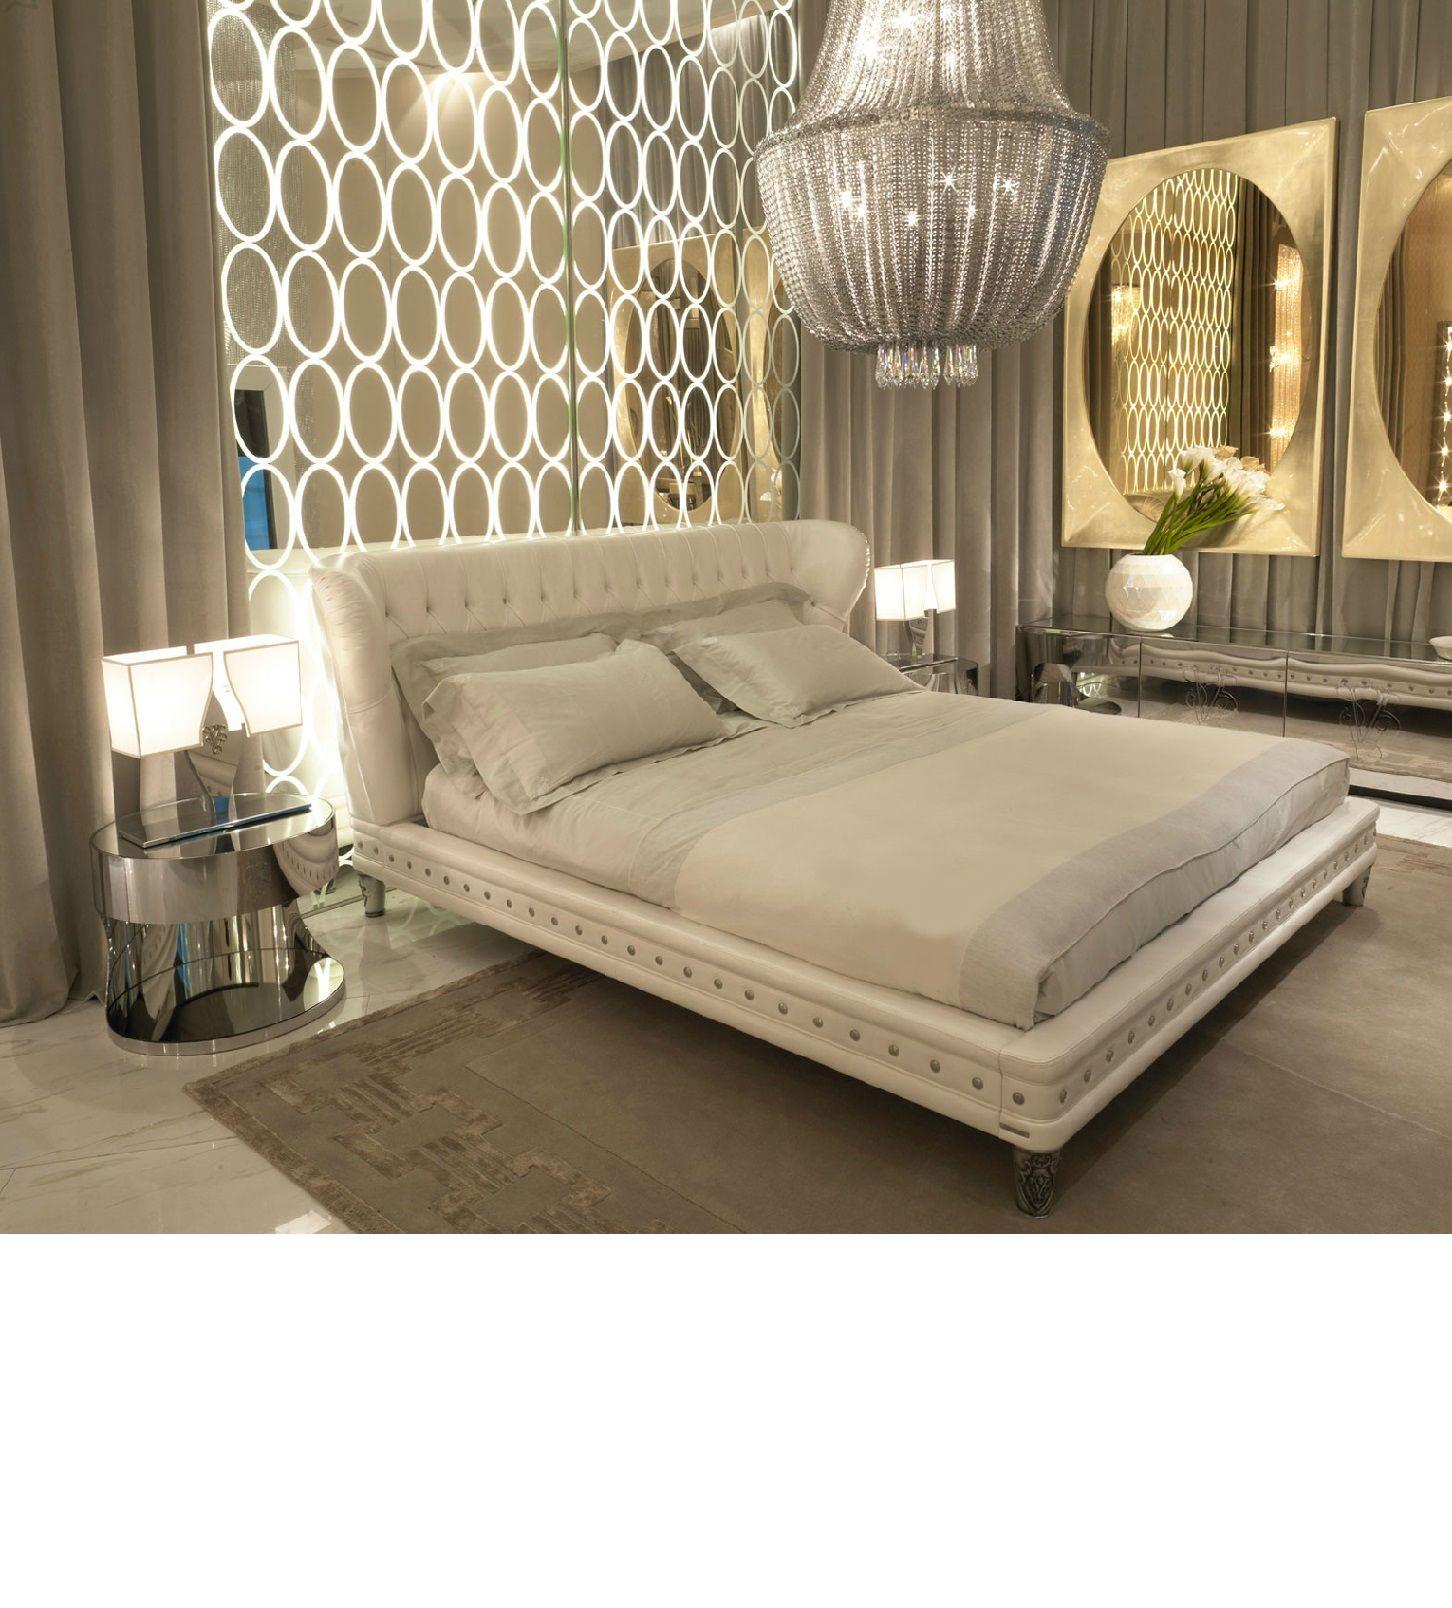 Luxury Bedrooms Luxury Bedroom Furniture Designer Bedroom Furniture By Instyle Decor Luxurious Bedrooms Luxury Bedroom Furniture Custom Bedroom Furniture